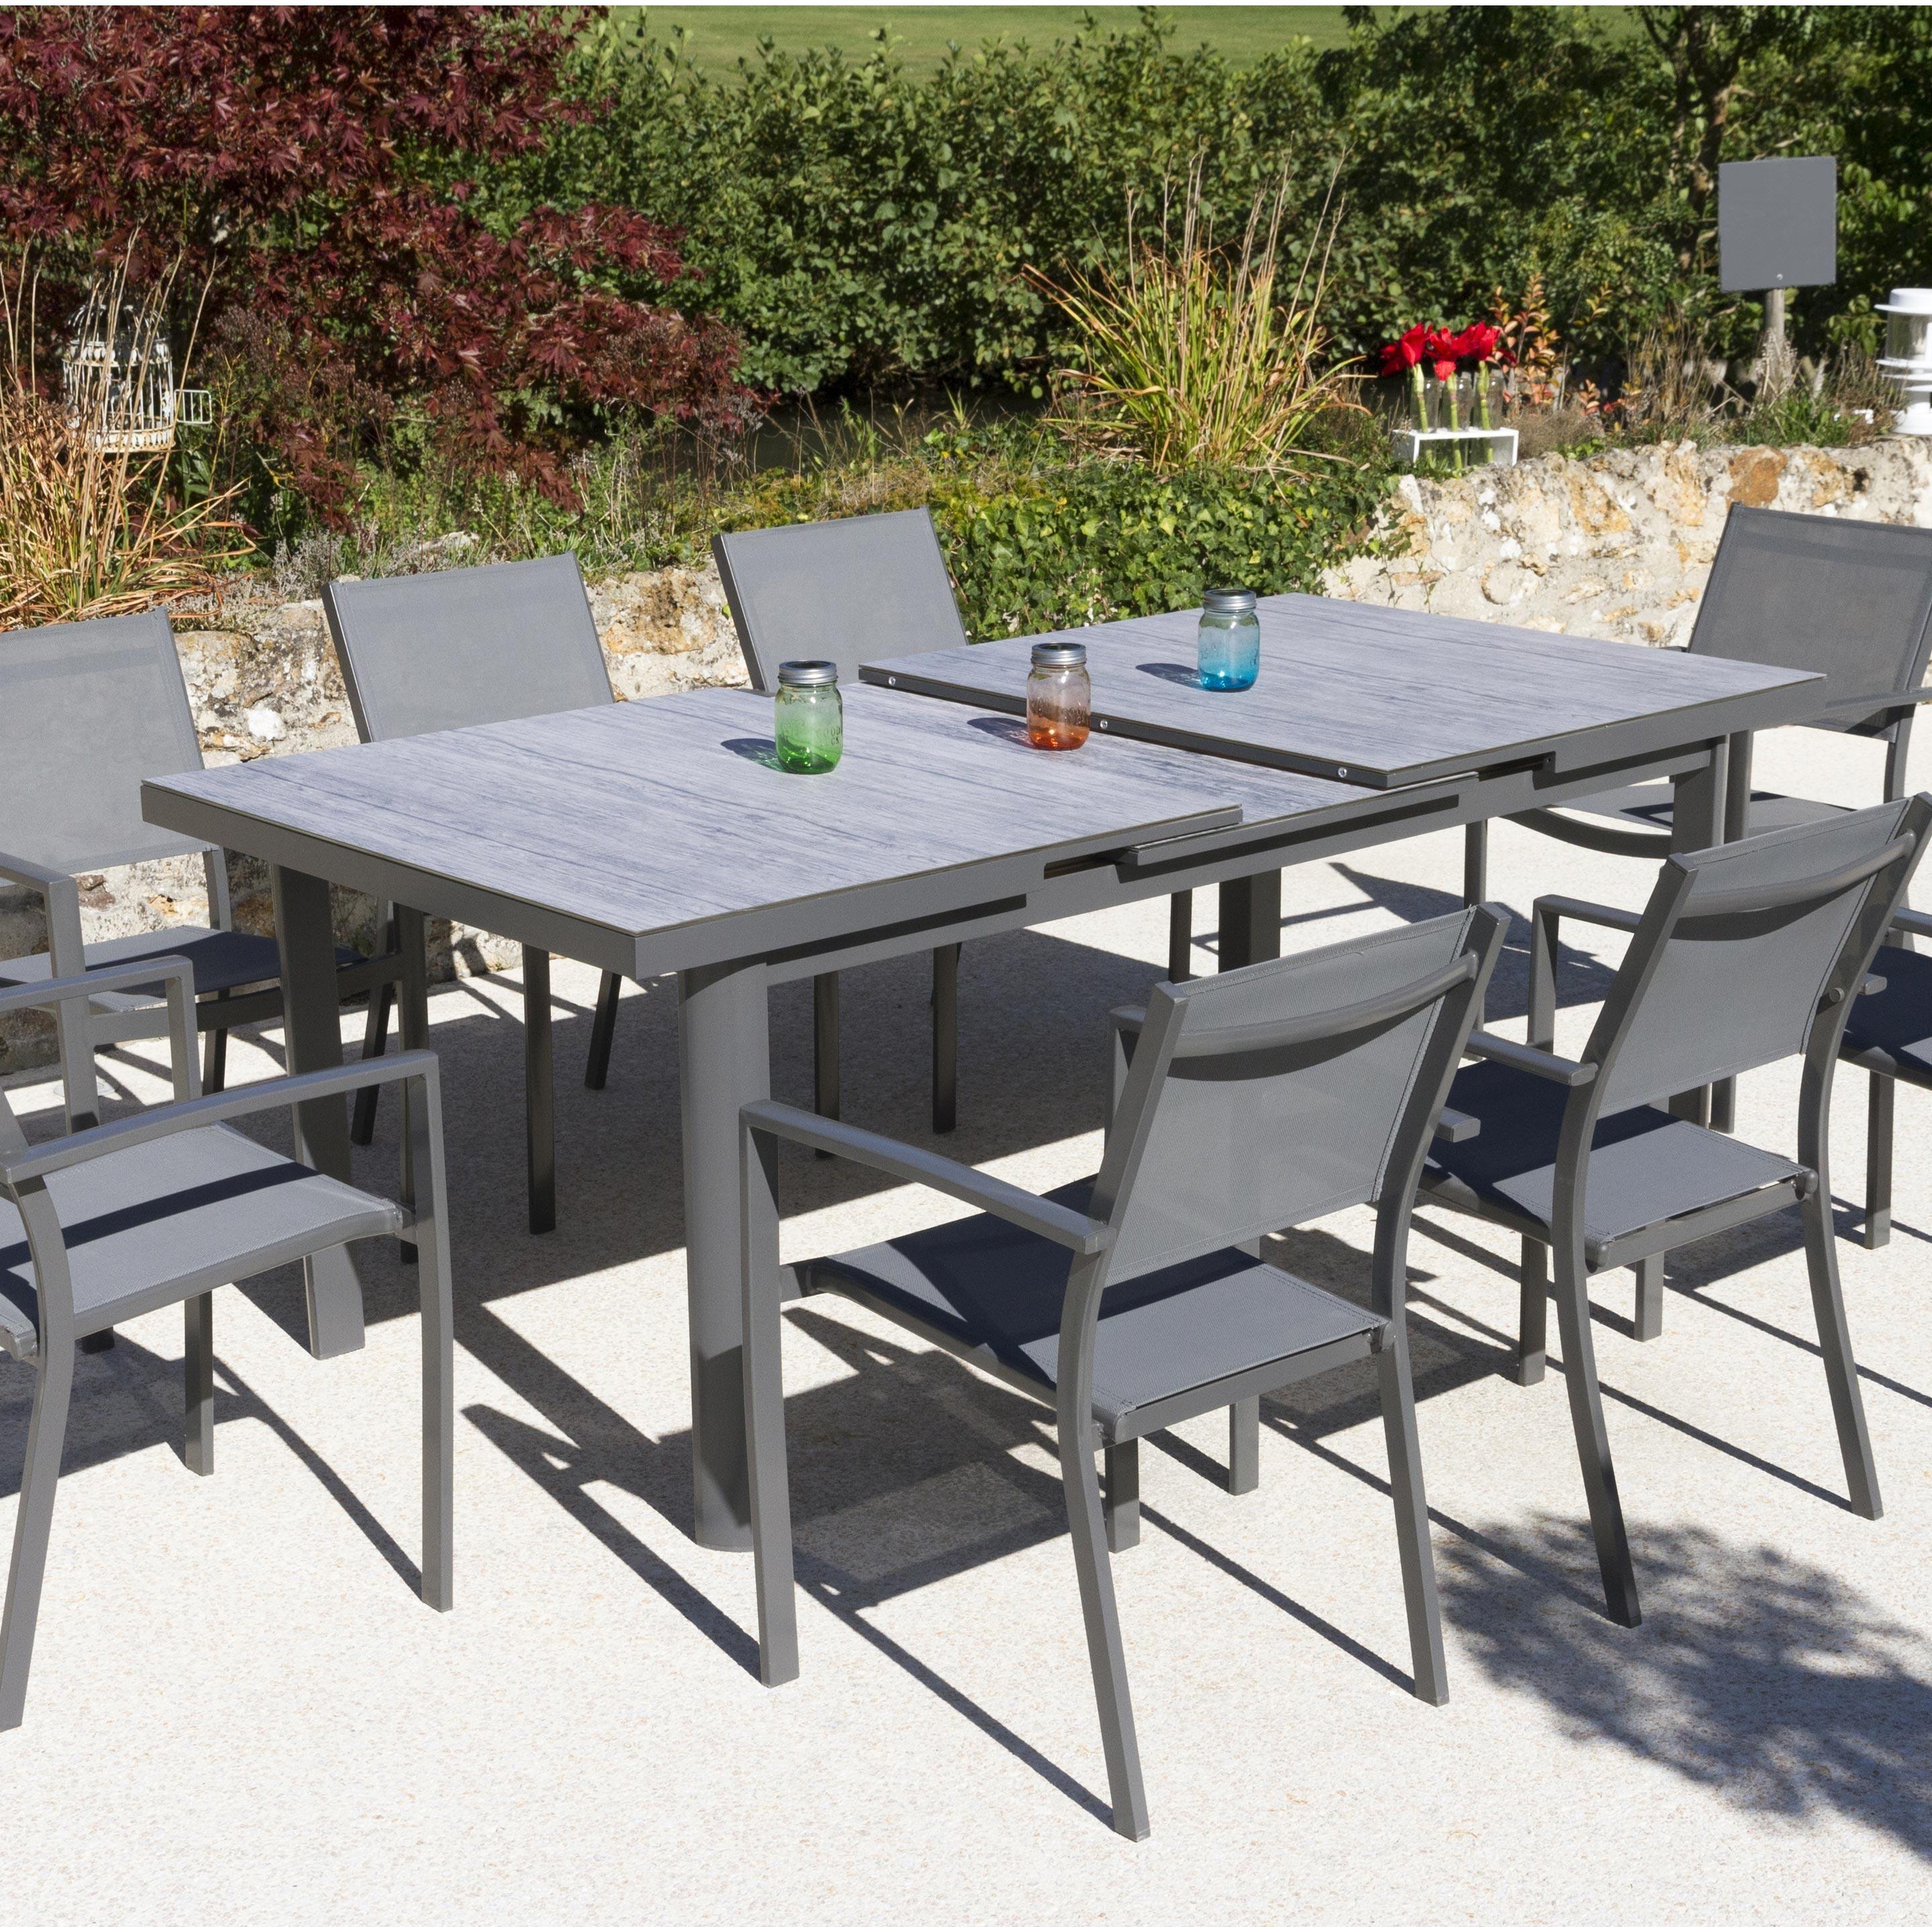 Table Aluminium Et Verre Allonge Auto Lo 180 240 X La 100 Cm Terria Menthe Leroy Merlin